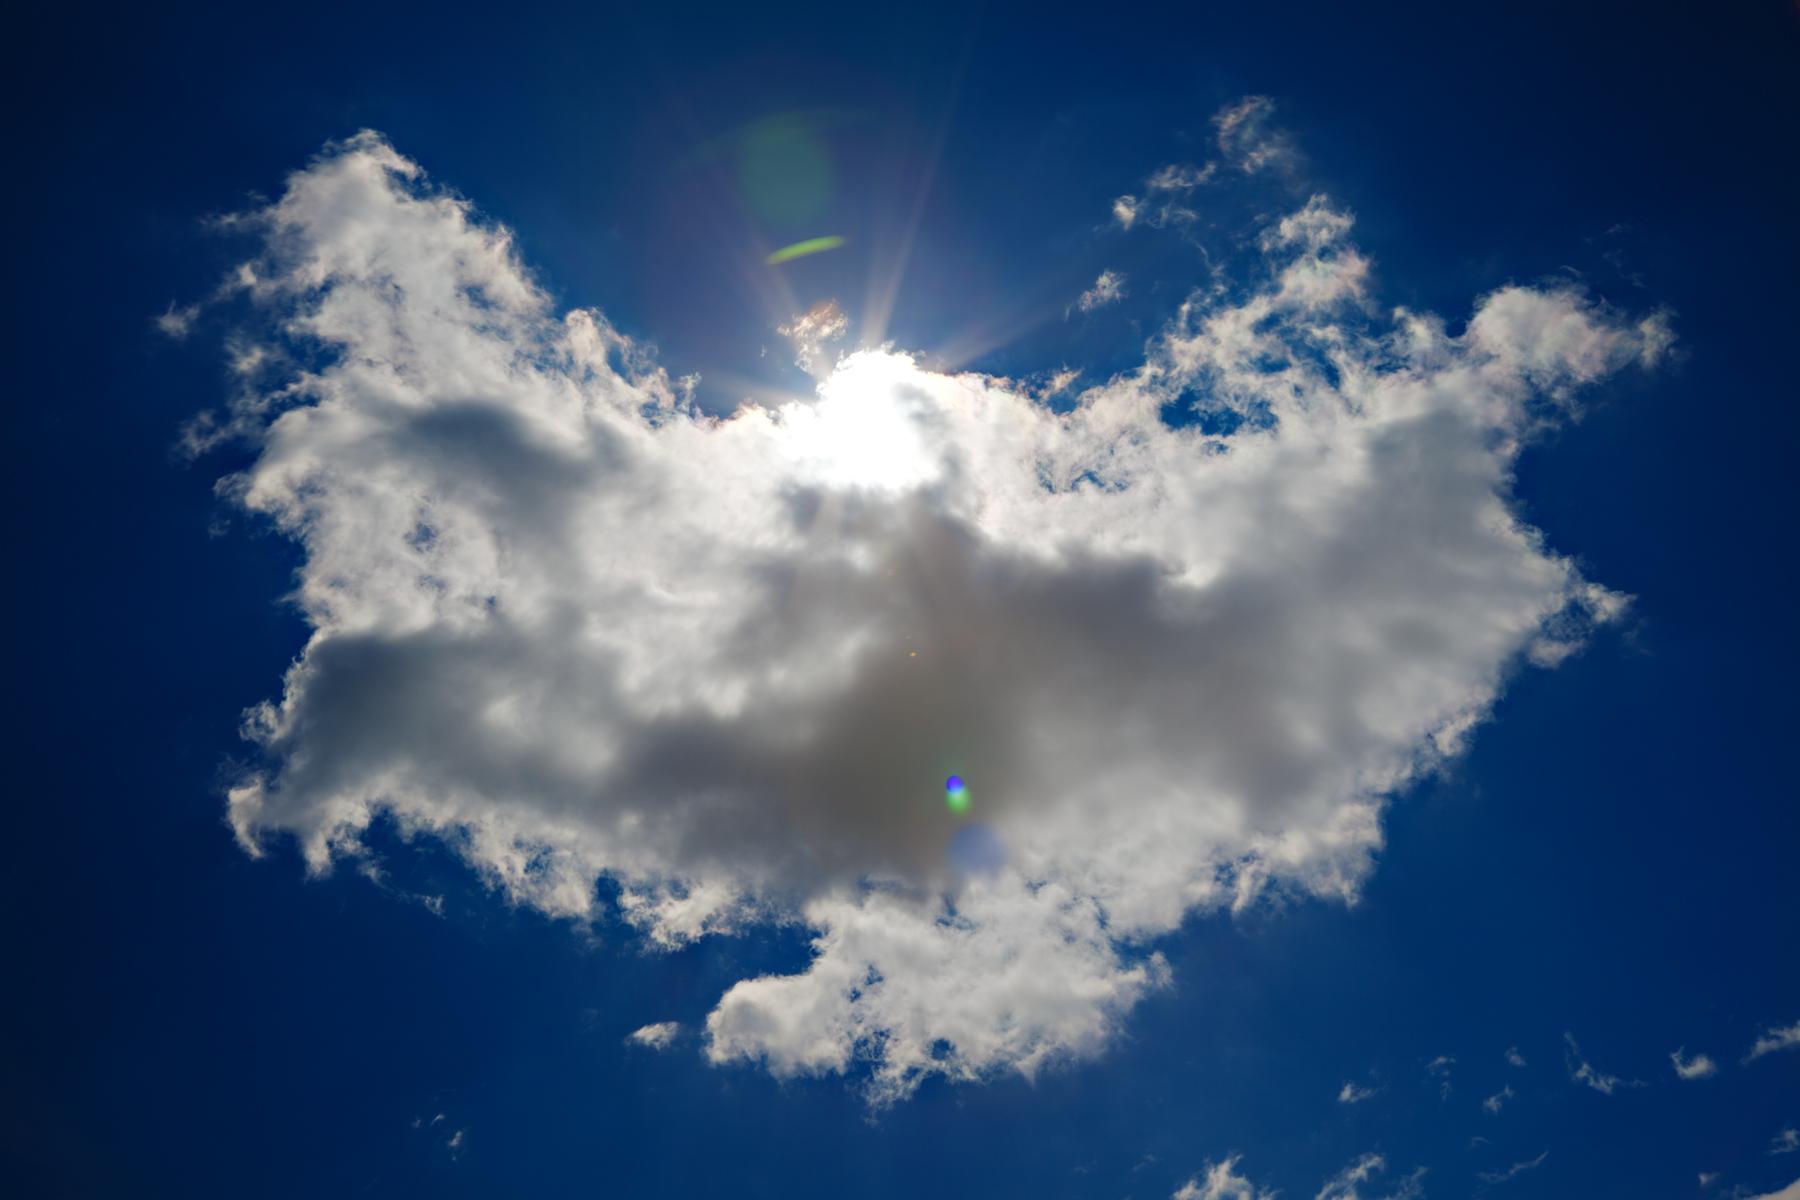 Angel Cloud - Angel Cloud - Nicolas Raymond - CC2.0 Attribution